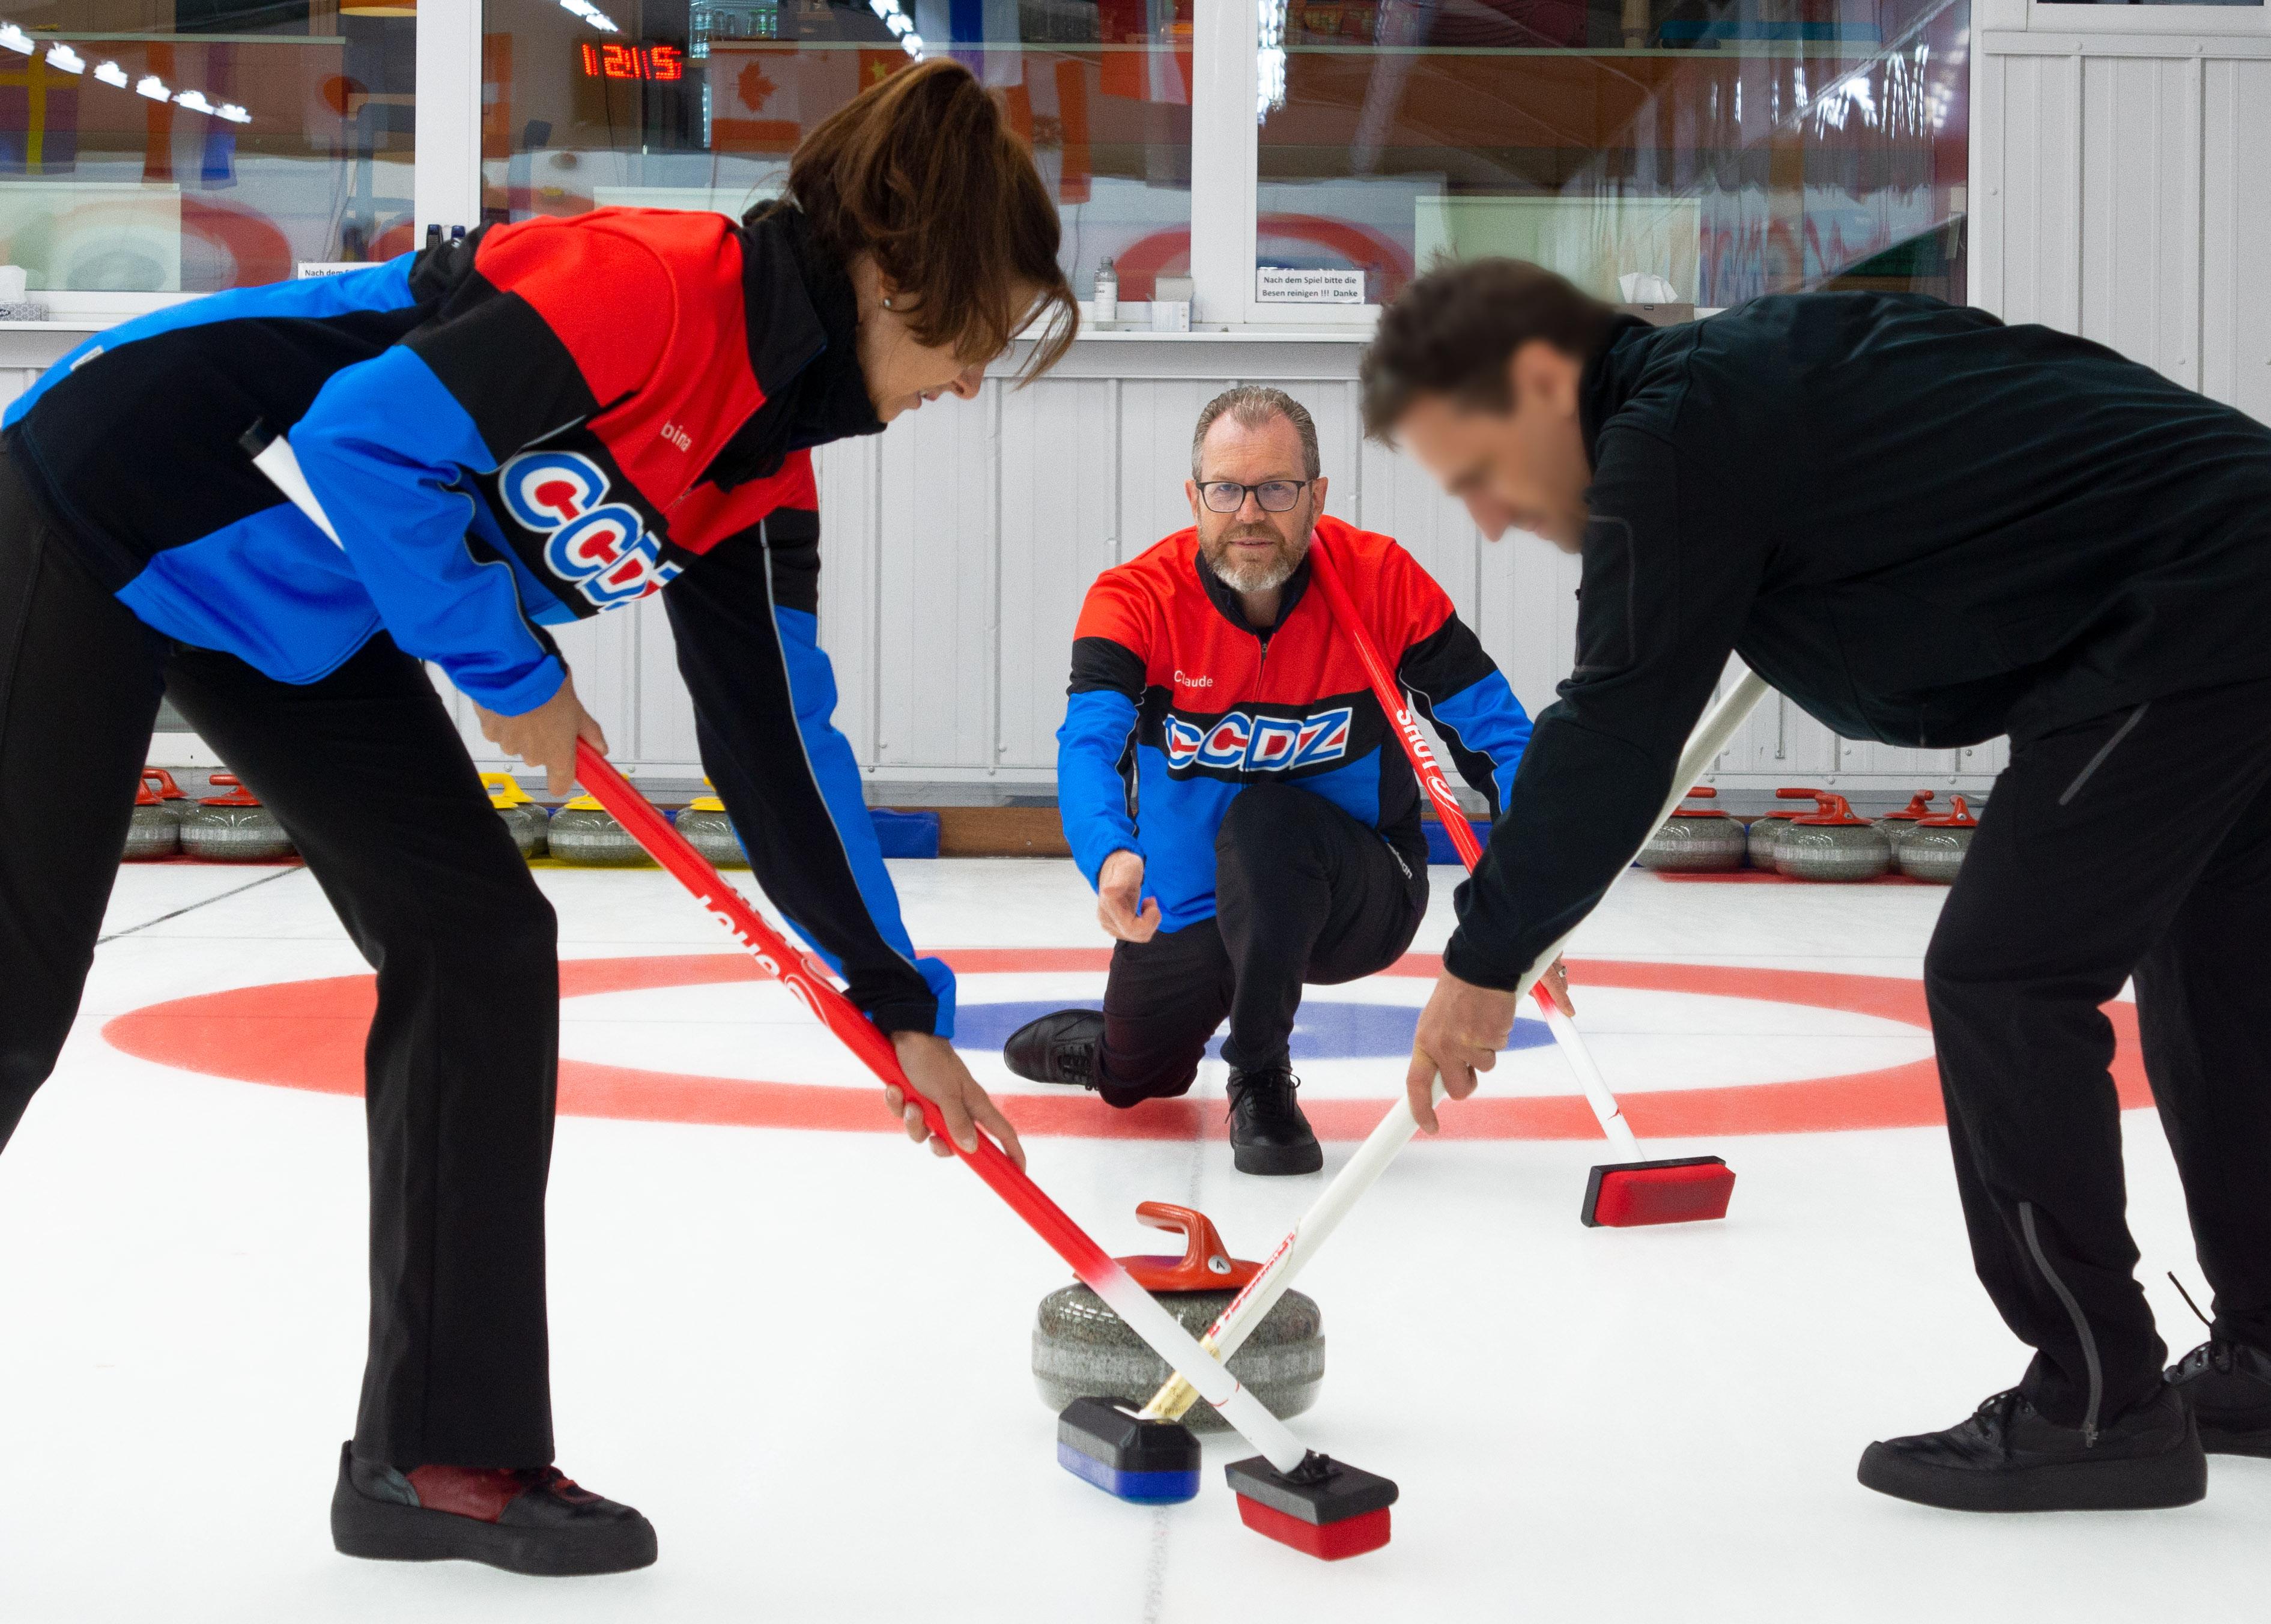 20201216_CCDZ_Curling